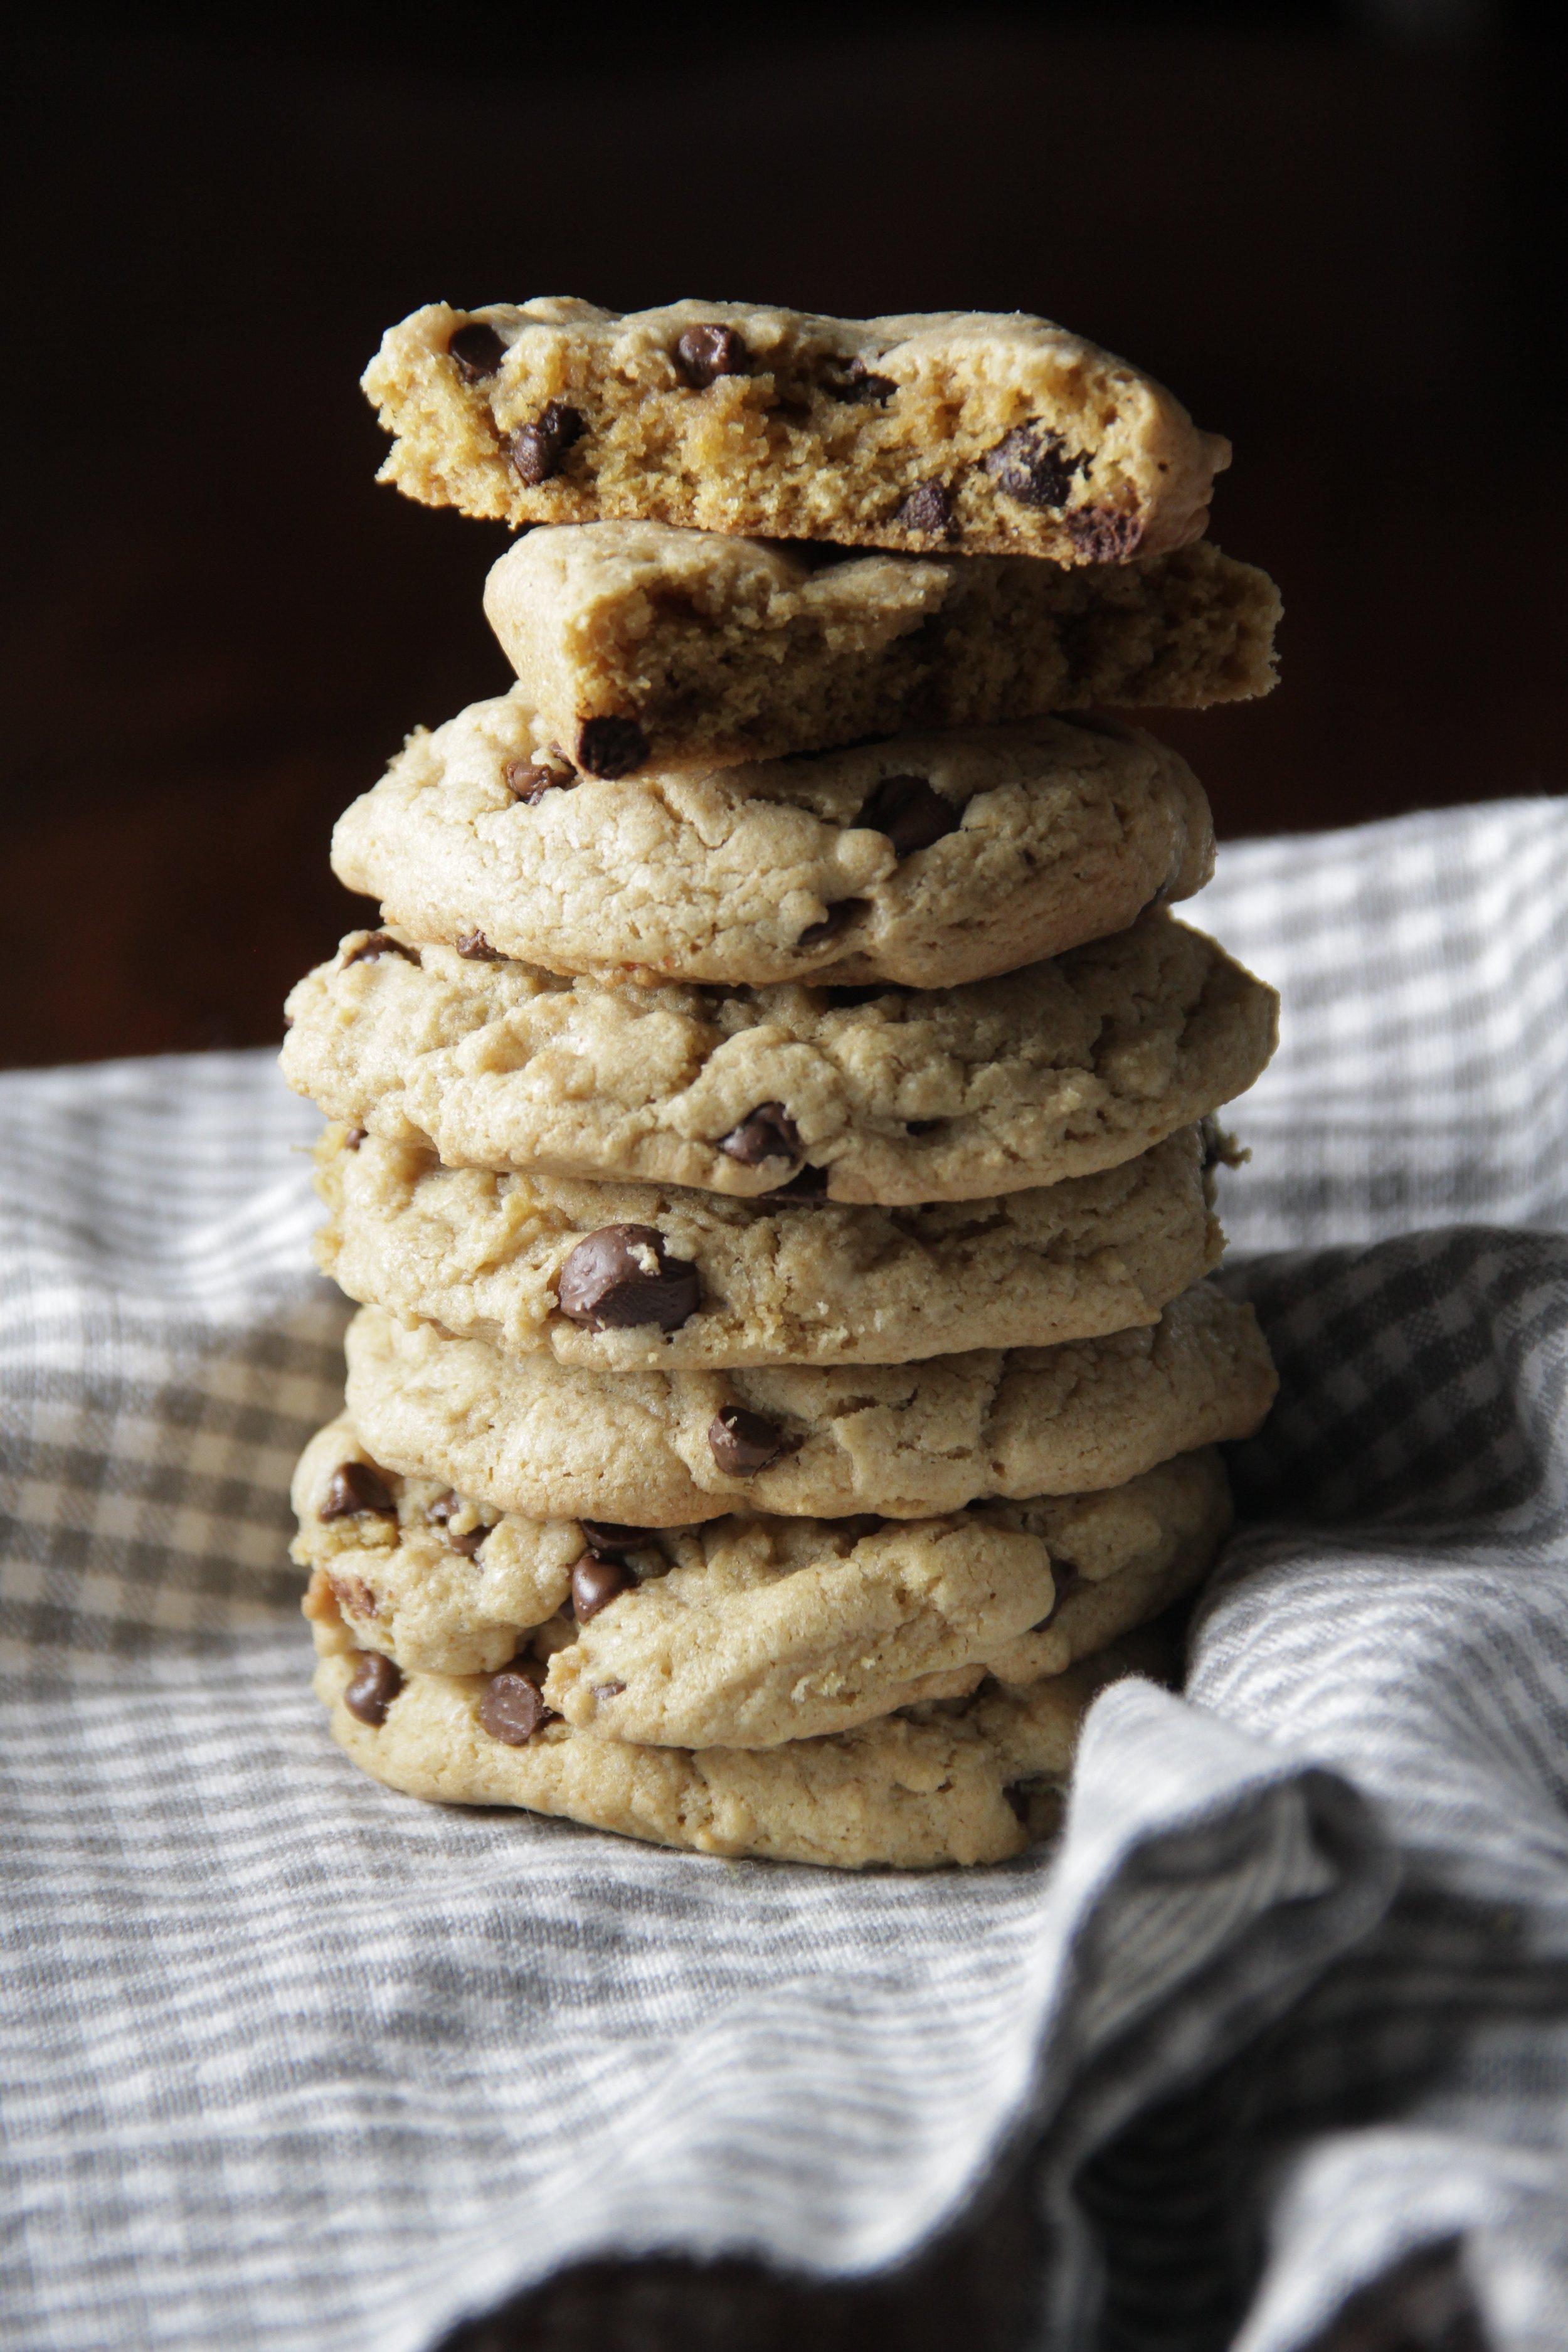 ruth-reyer-tall cookie stack-unsplash.jpg